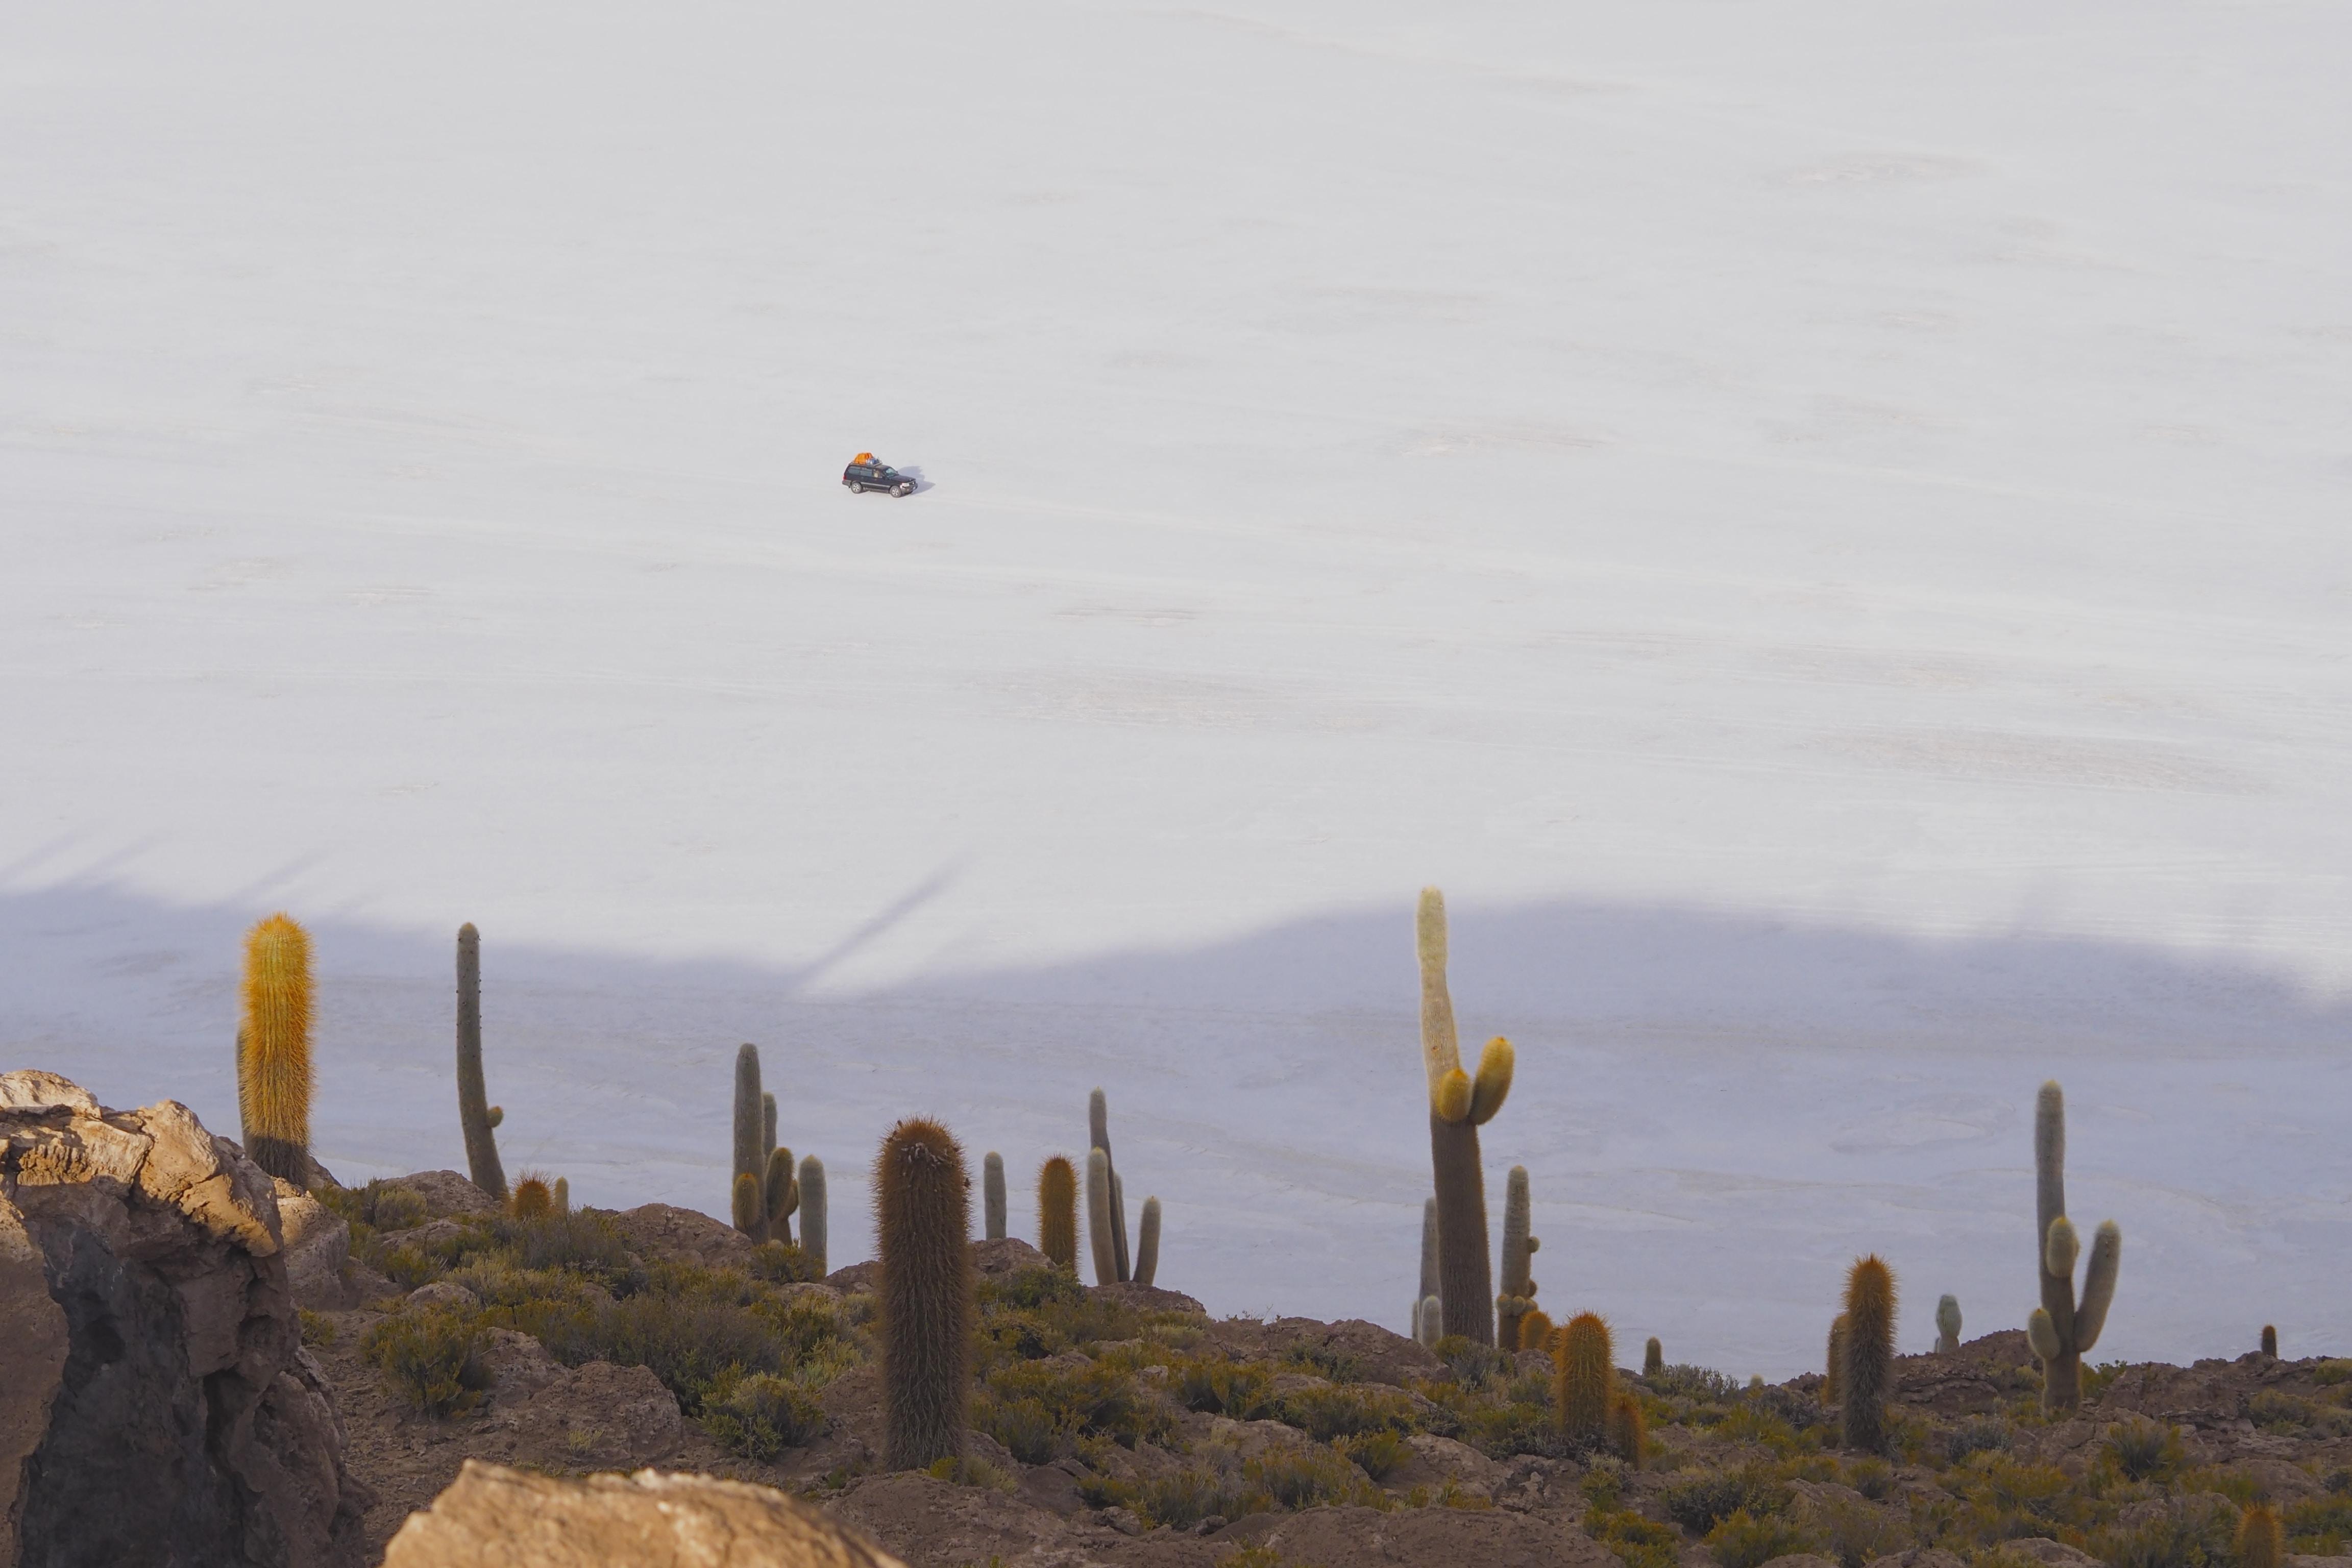 green cacti at daytime